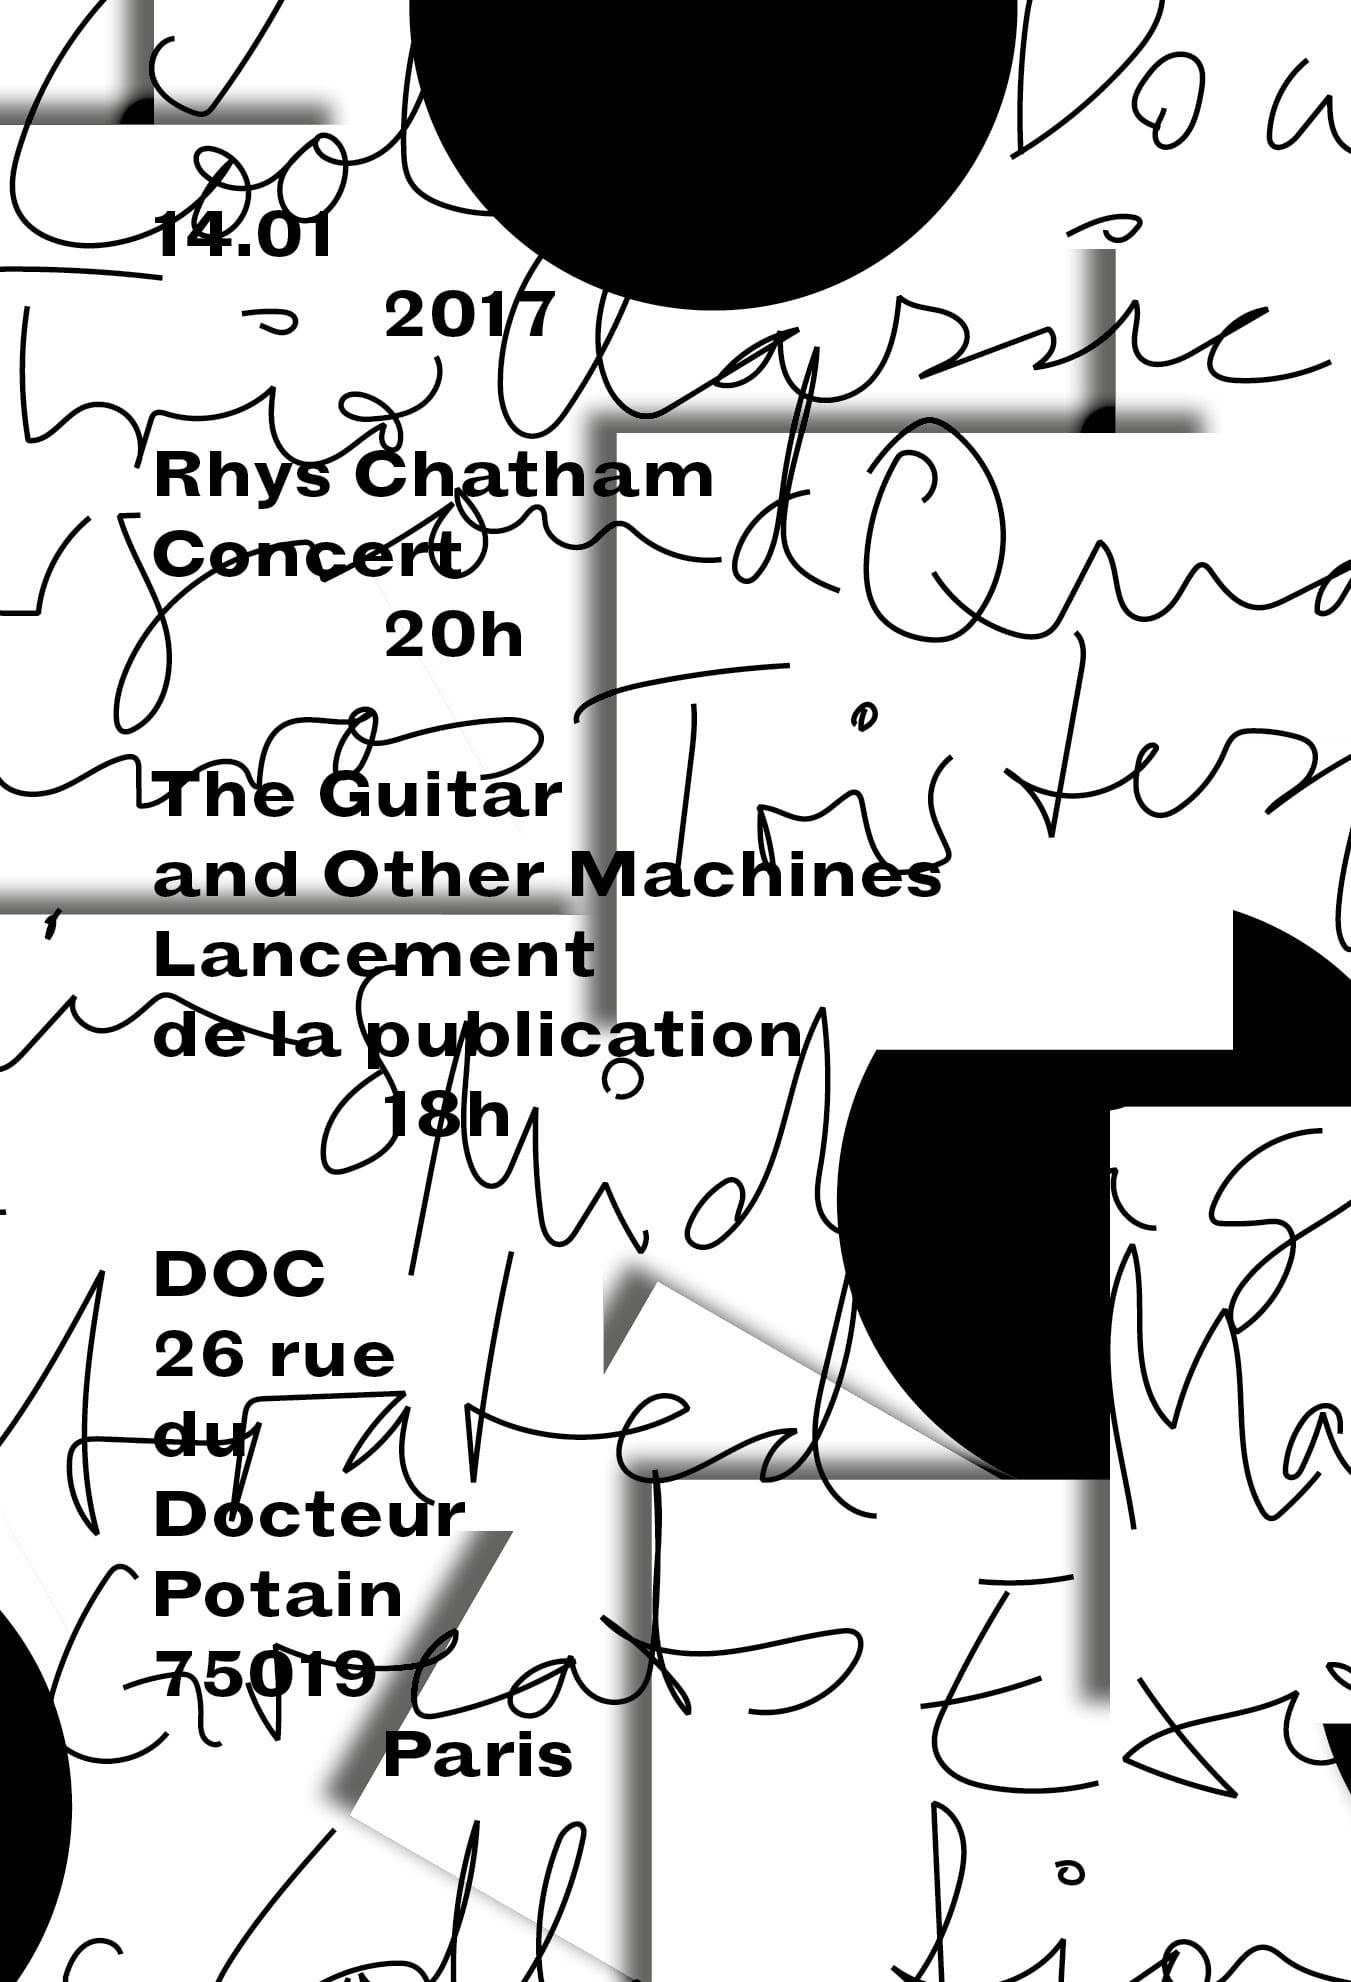 Concert - Rhys Chattham